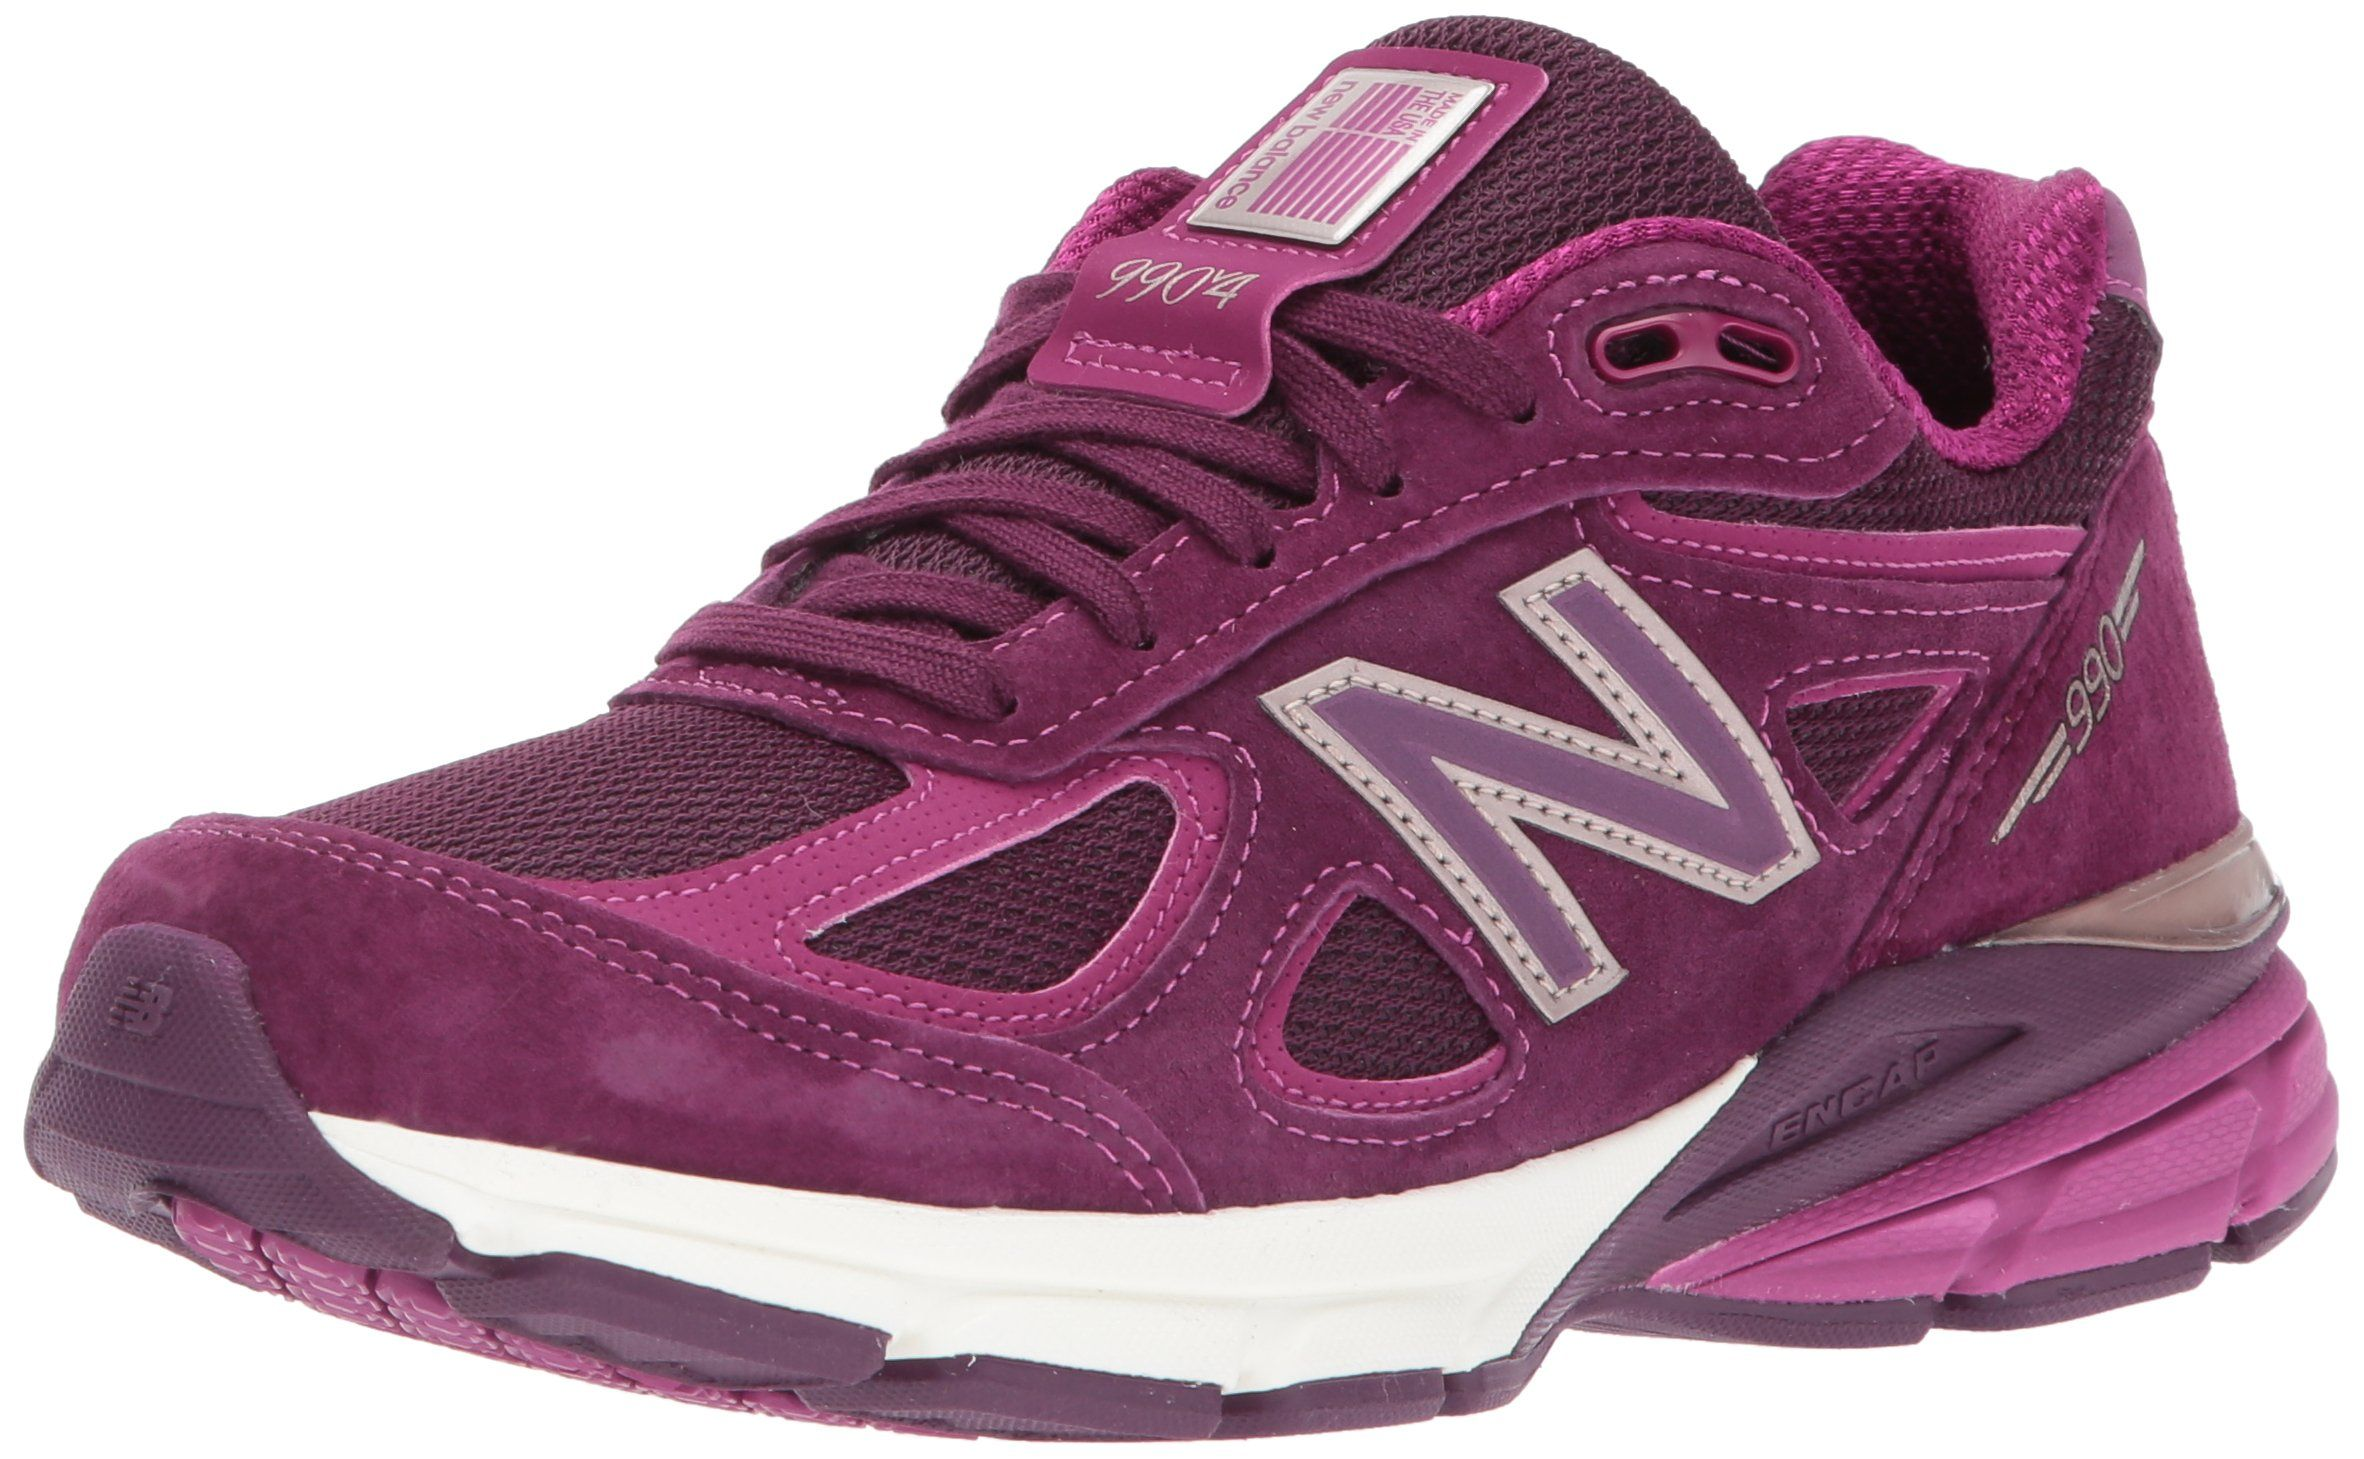 100% authentic 6e7f6 3dd02 New Balance Womens 990V4 Running Shoe Dark Mulberry 7 B US ...